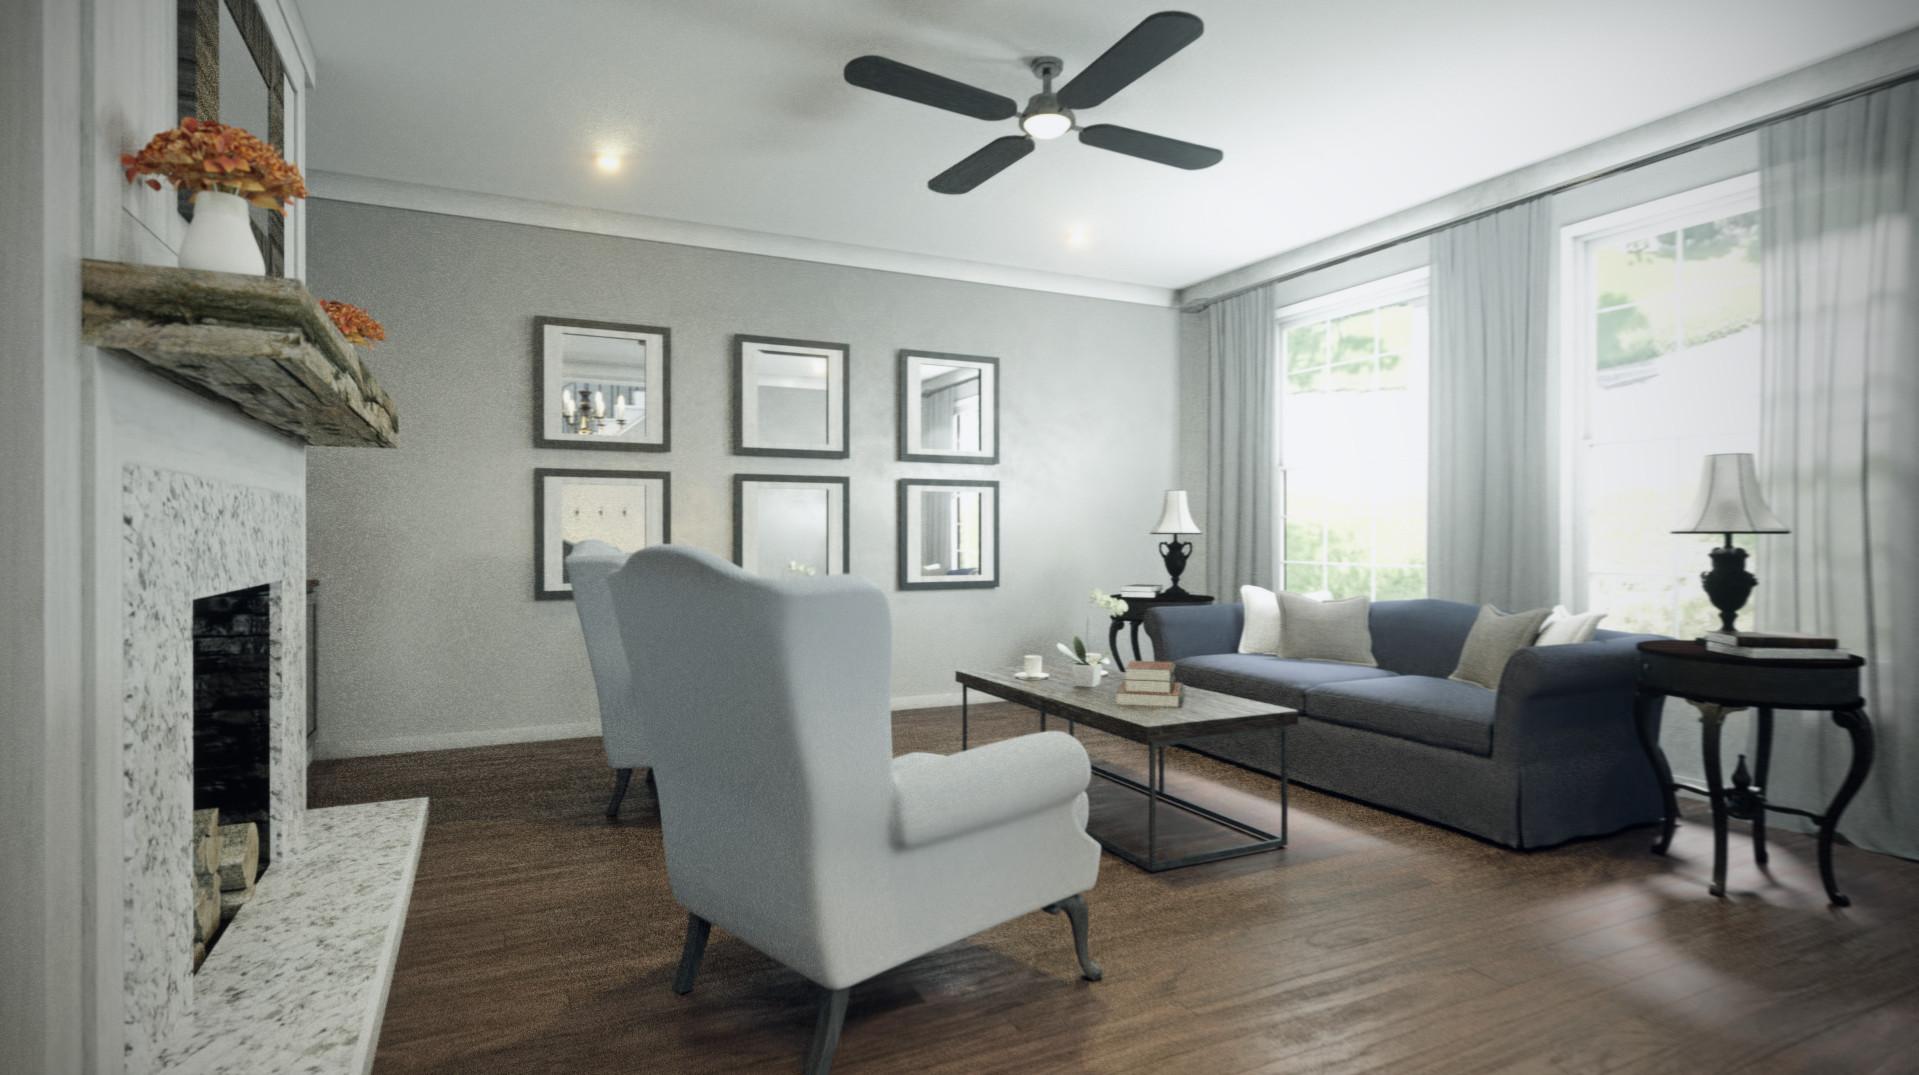 The best 100 winning fixer upper 3 image collections for Interior design deutsch